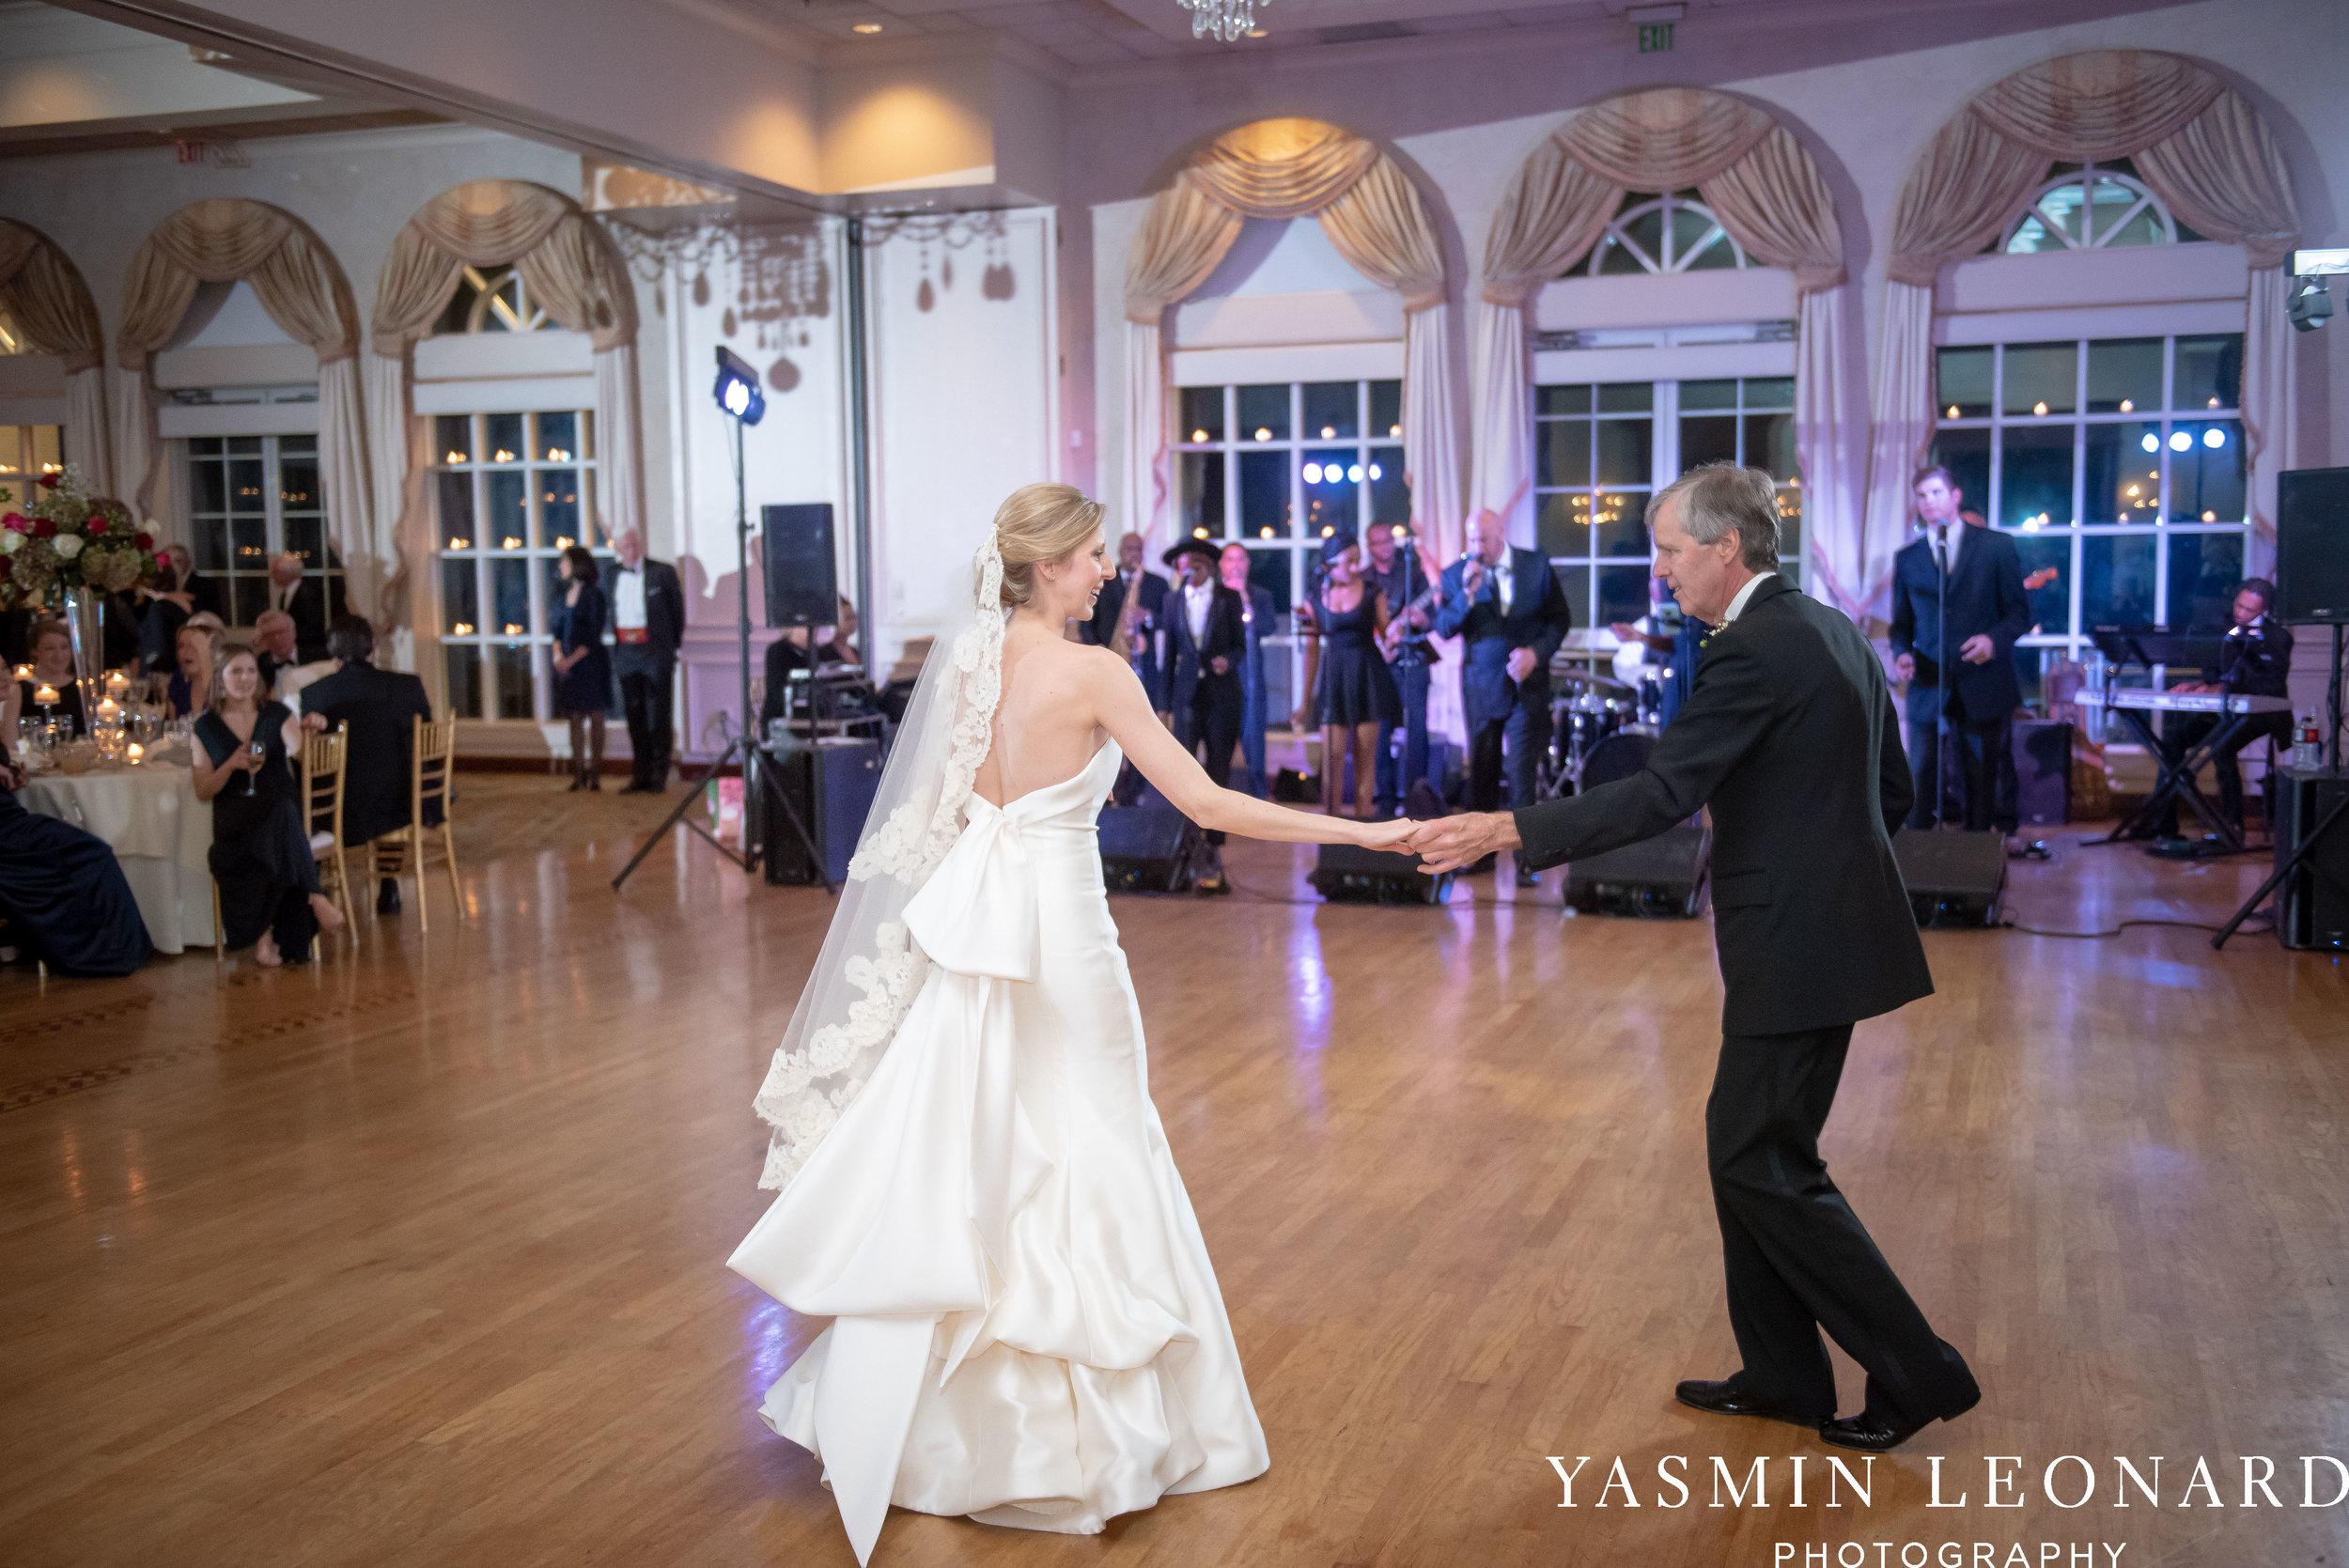 Wesley Memorial UMC - High Point Country Club - Emerywood Country Club - High Point Weddings - High Point Wedding Photographer - Yasmin Leonard Photography-40.jpg